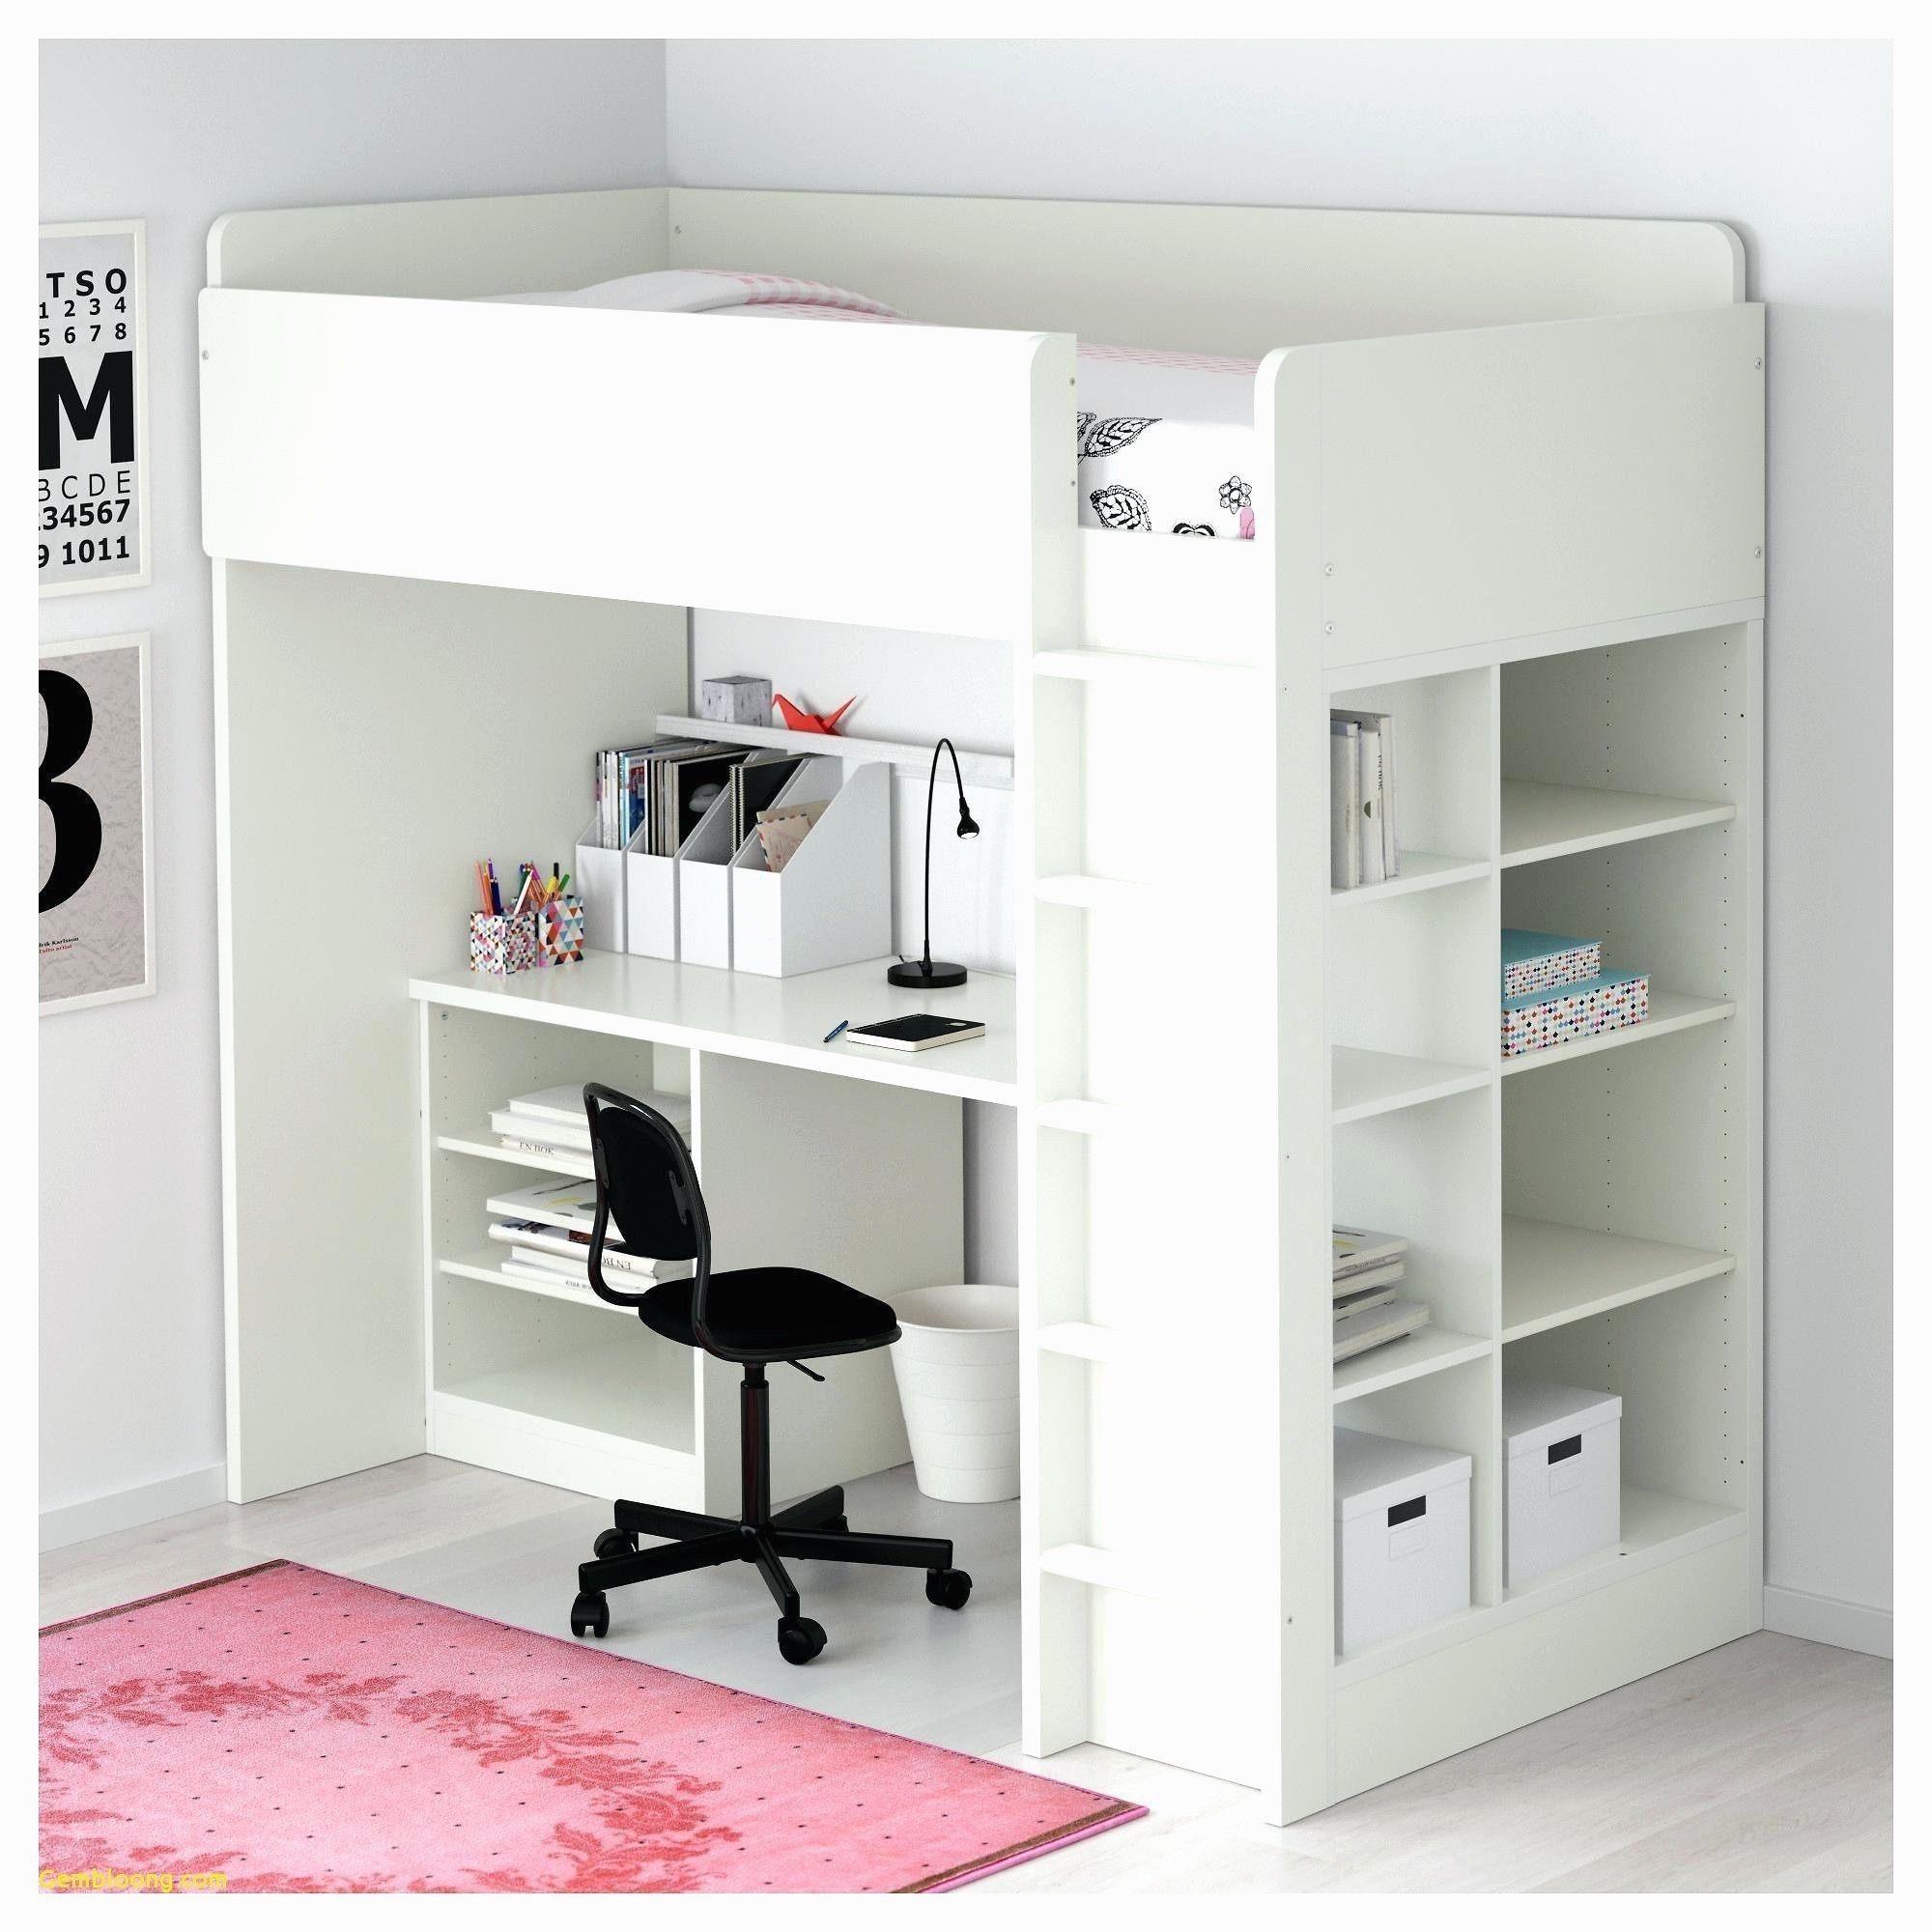 Lit Superposé Mi Hauteur Meilleur De Ikea Lit Mi Hauteur